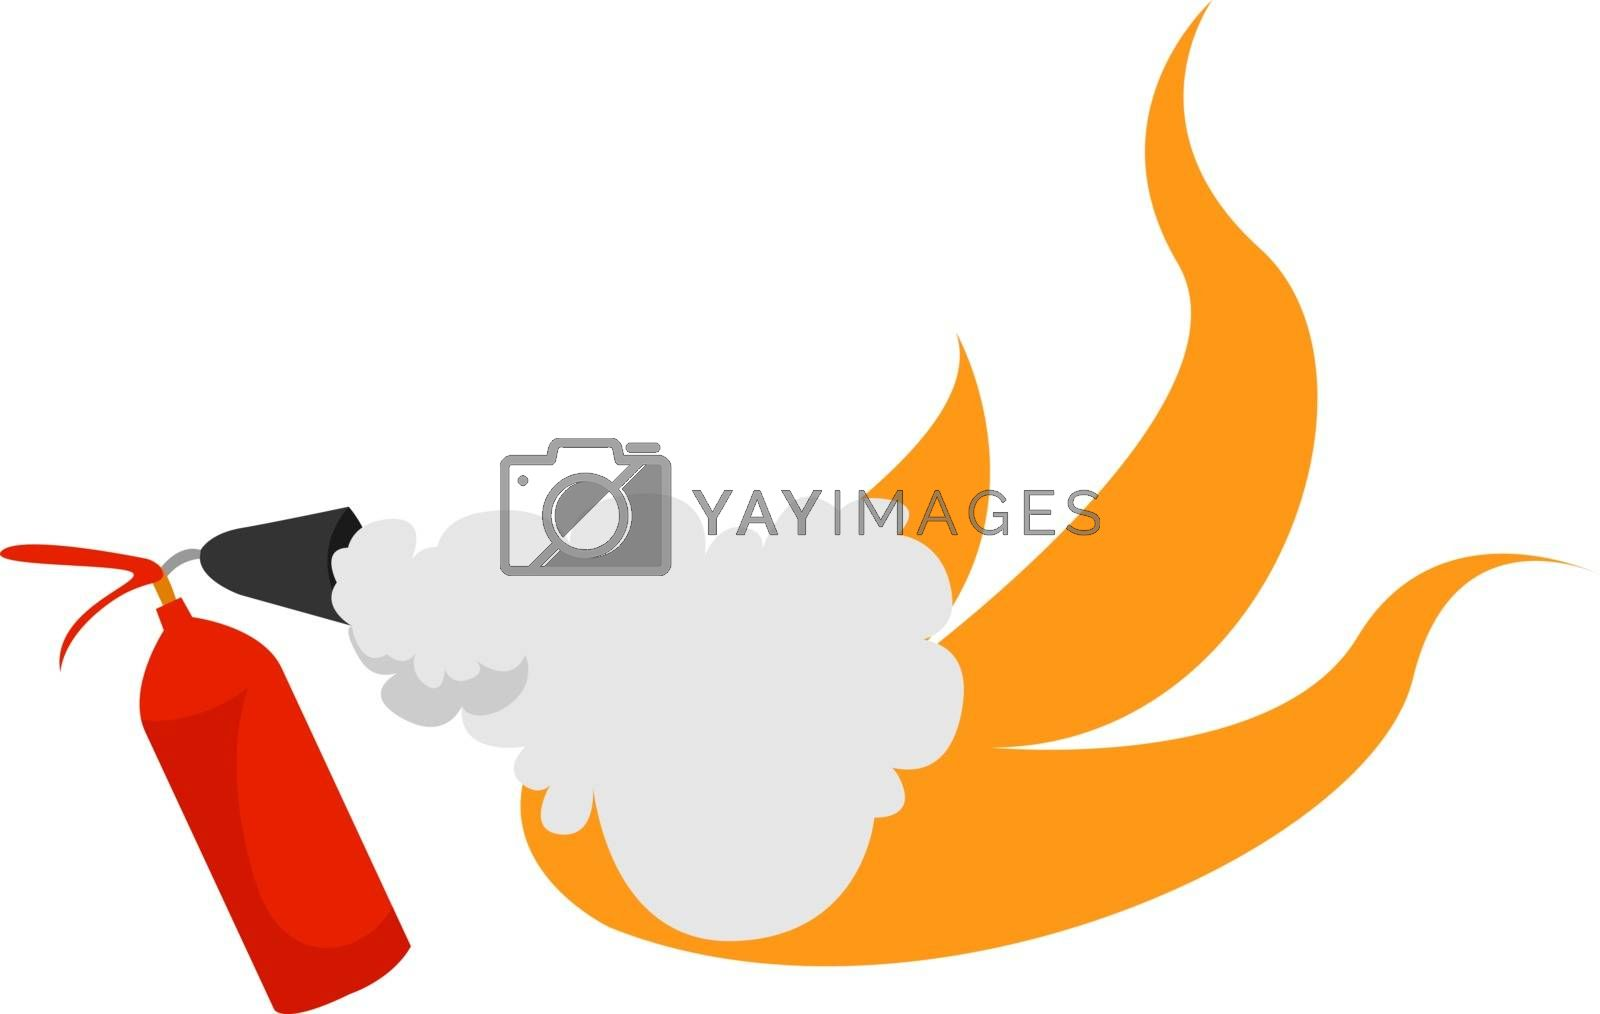 Fire extinguisher, illustration, vector on white background.